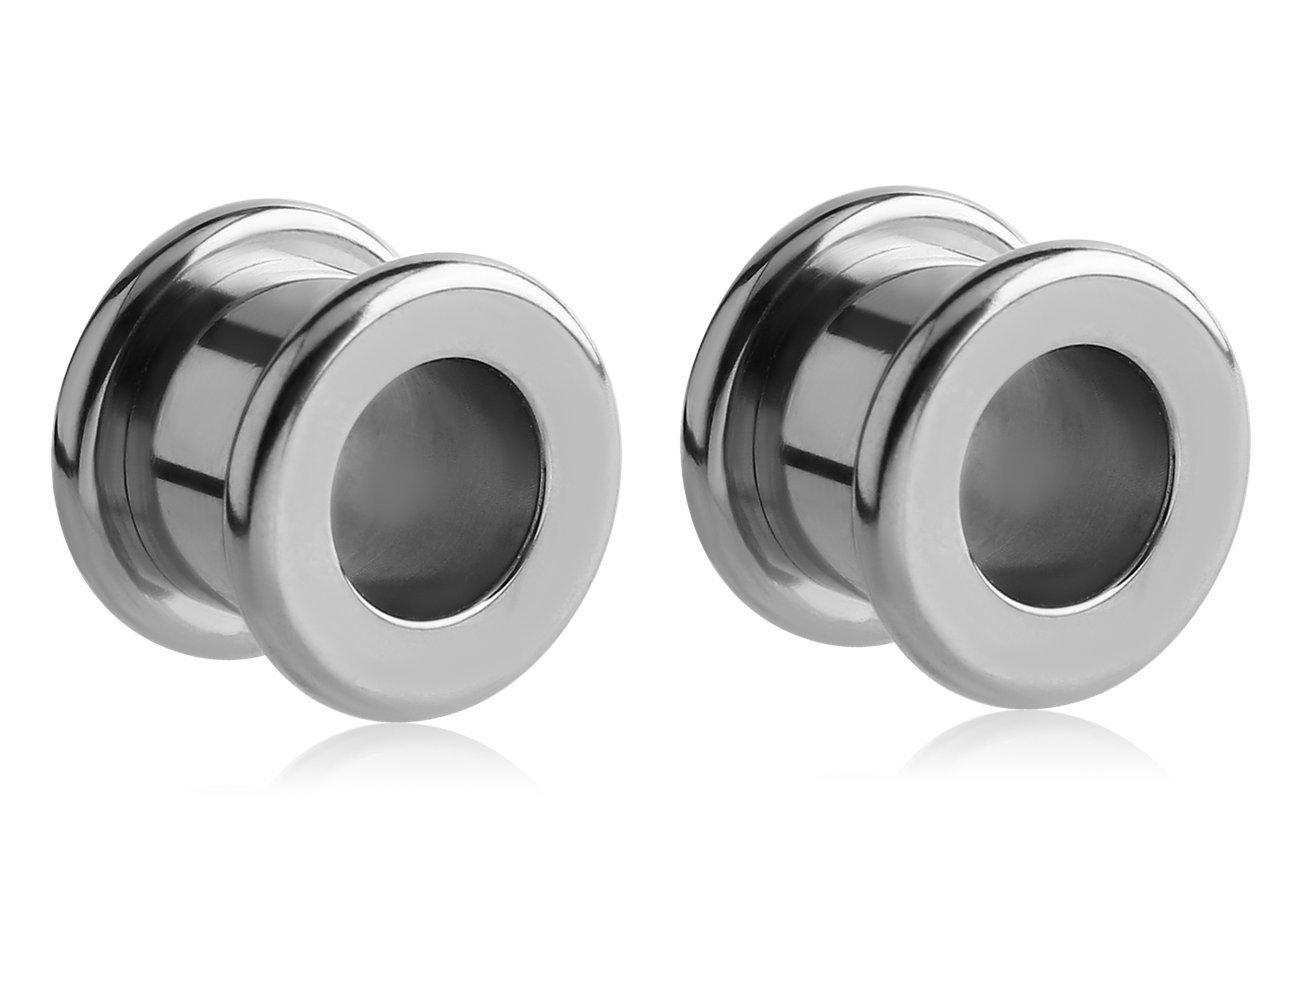 Holy Plug Body Piercing Jewelry Pair of 2 Titanium Round Edge Tunnel 0000g 11g 6g 4g 2g 1g 0g 00g by Holy Plug